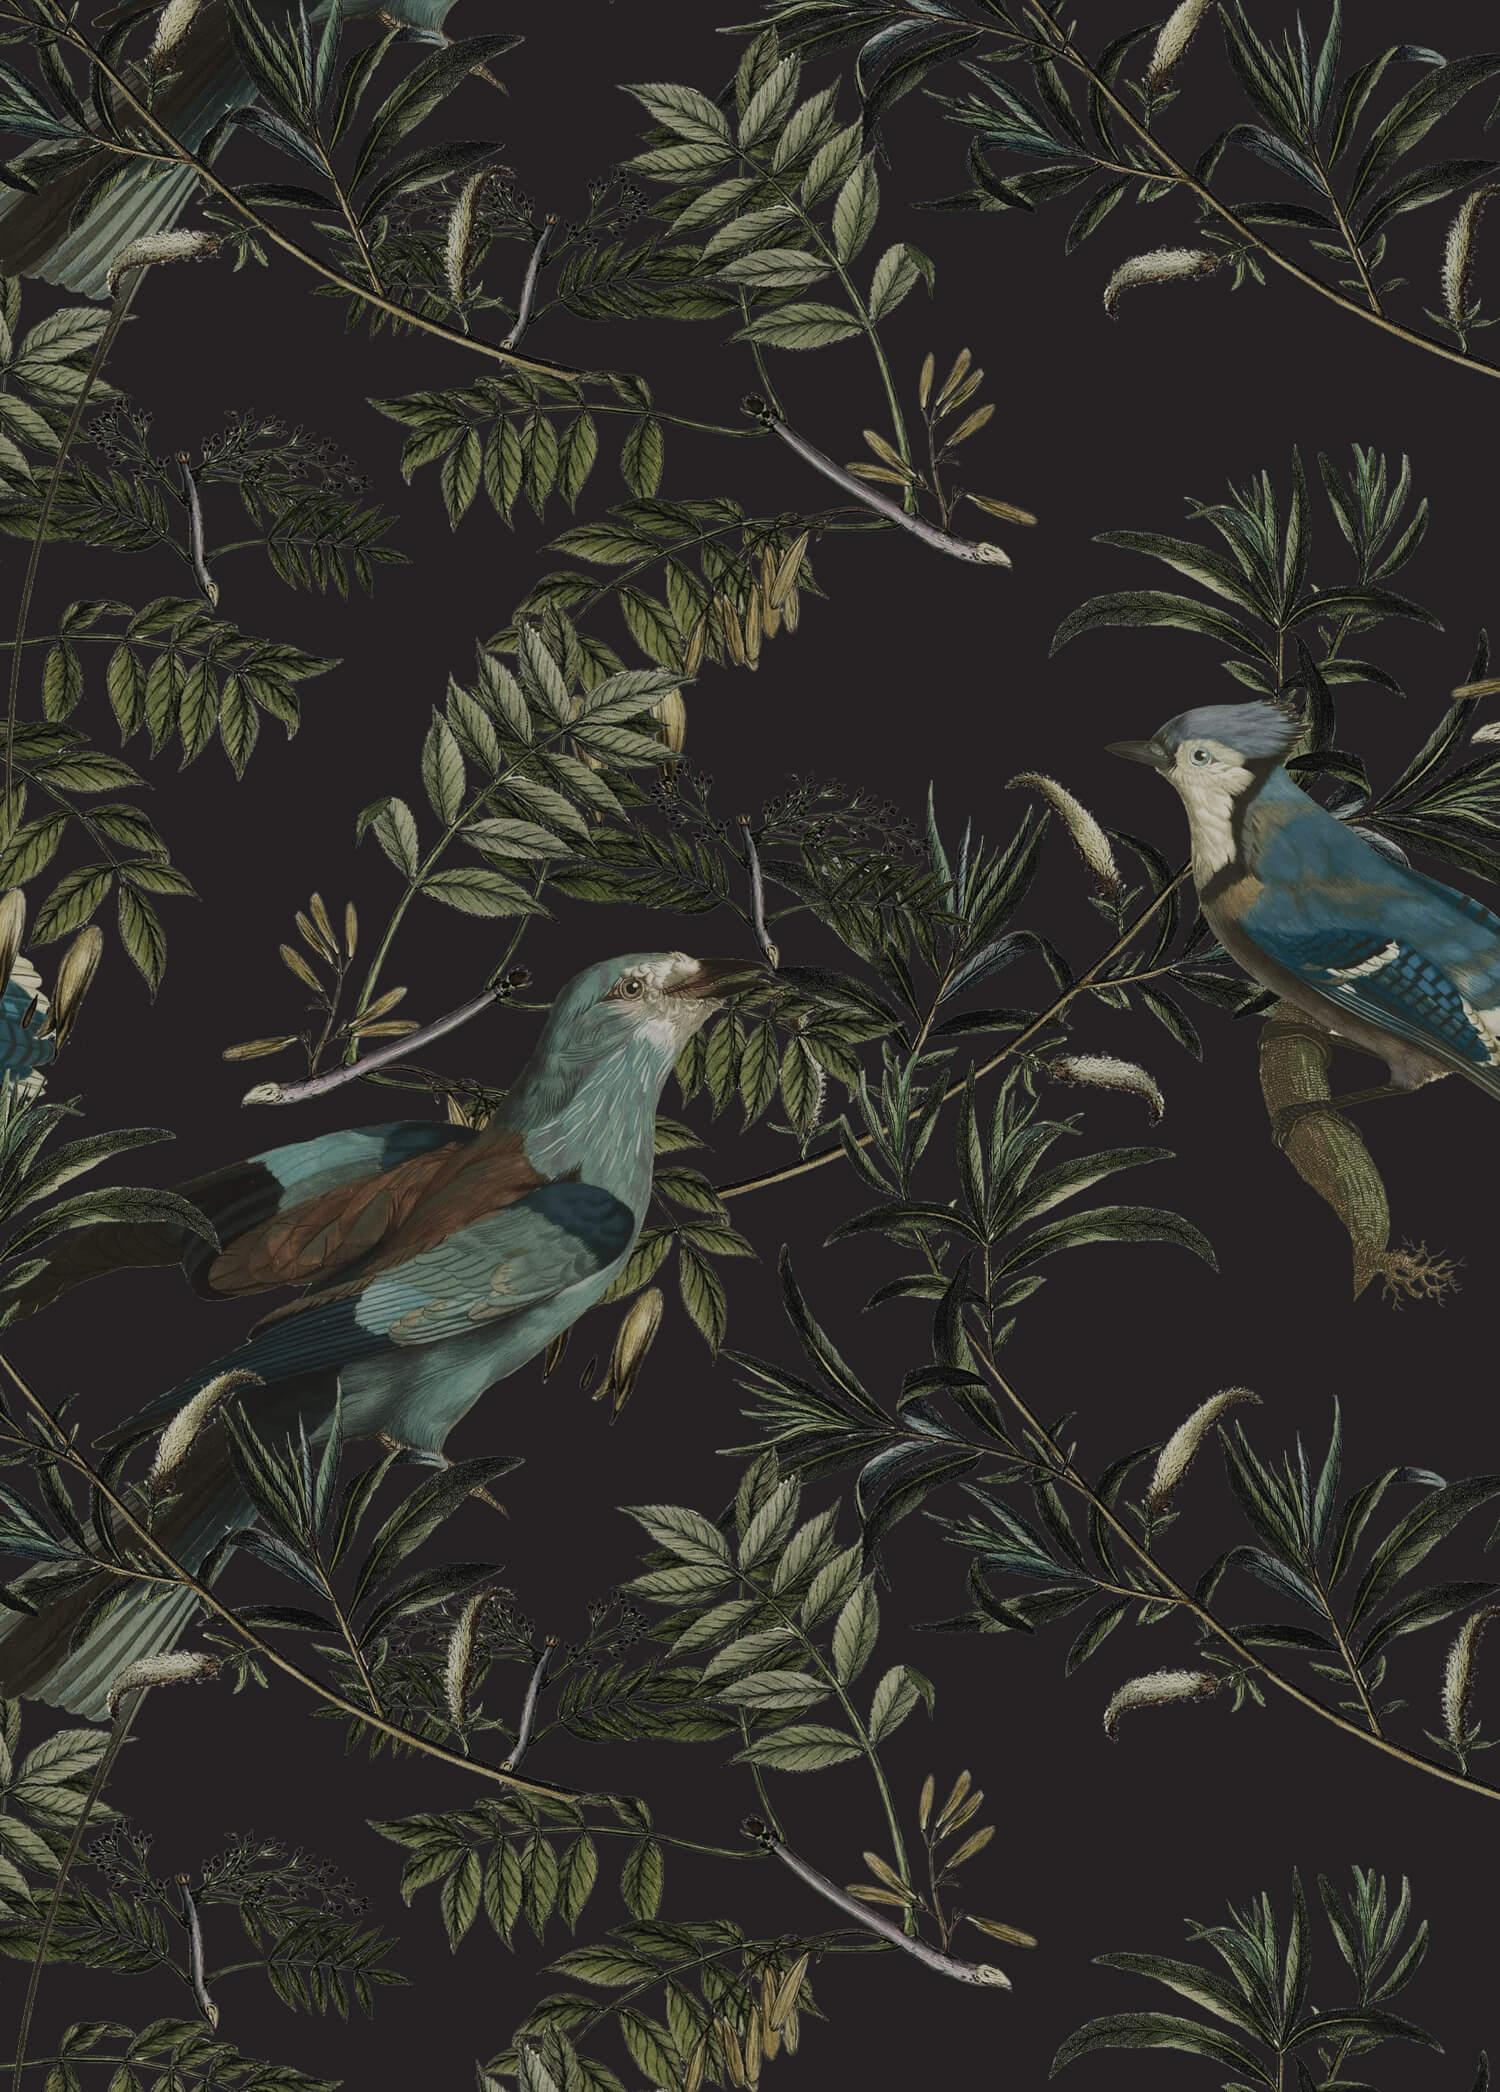 olga_mulica_birds_pattern_2